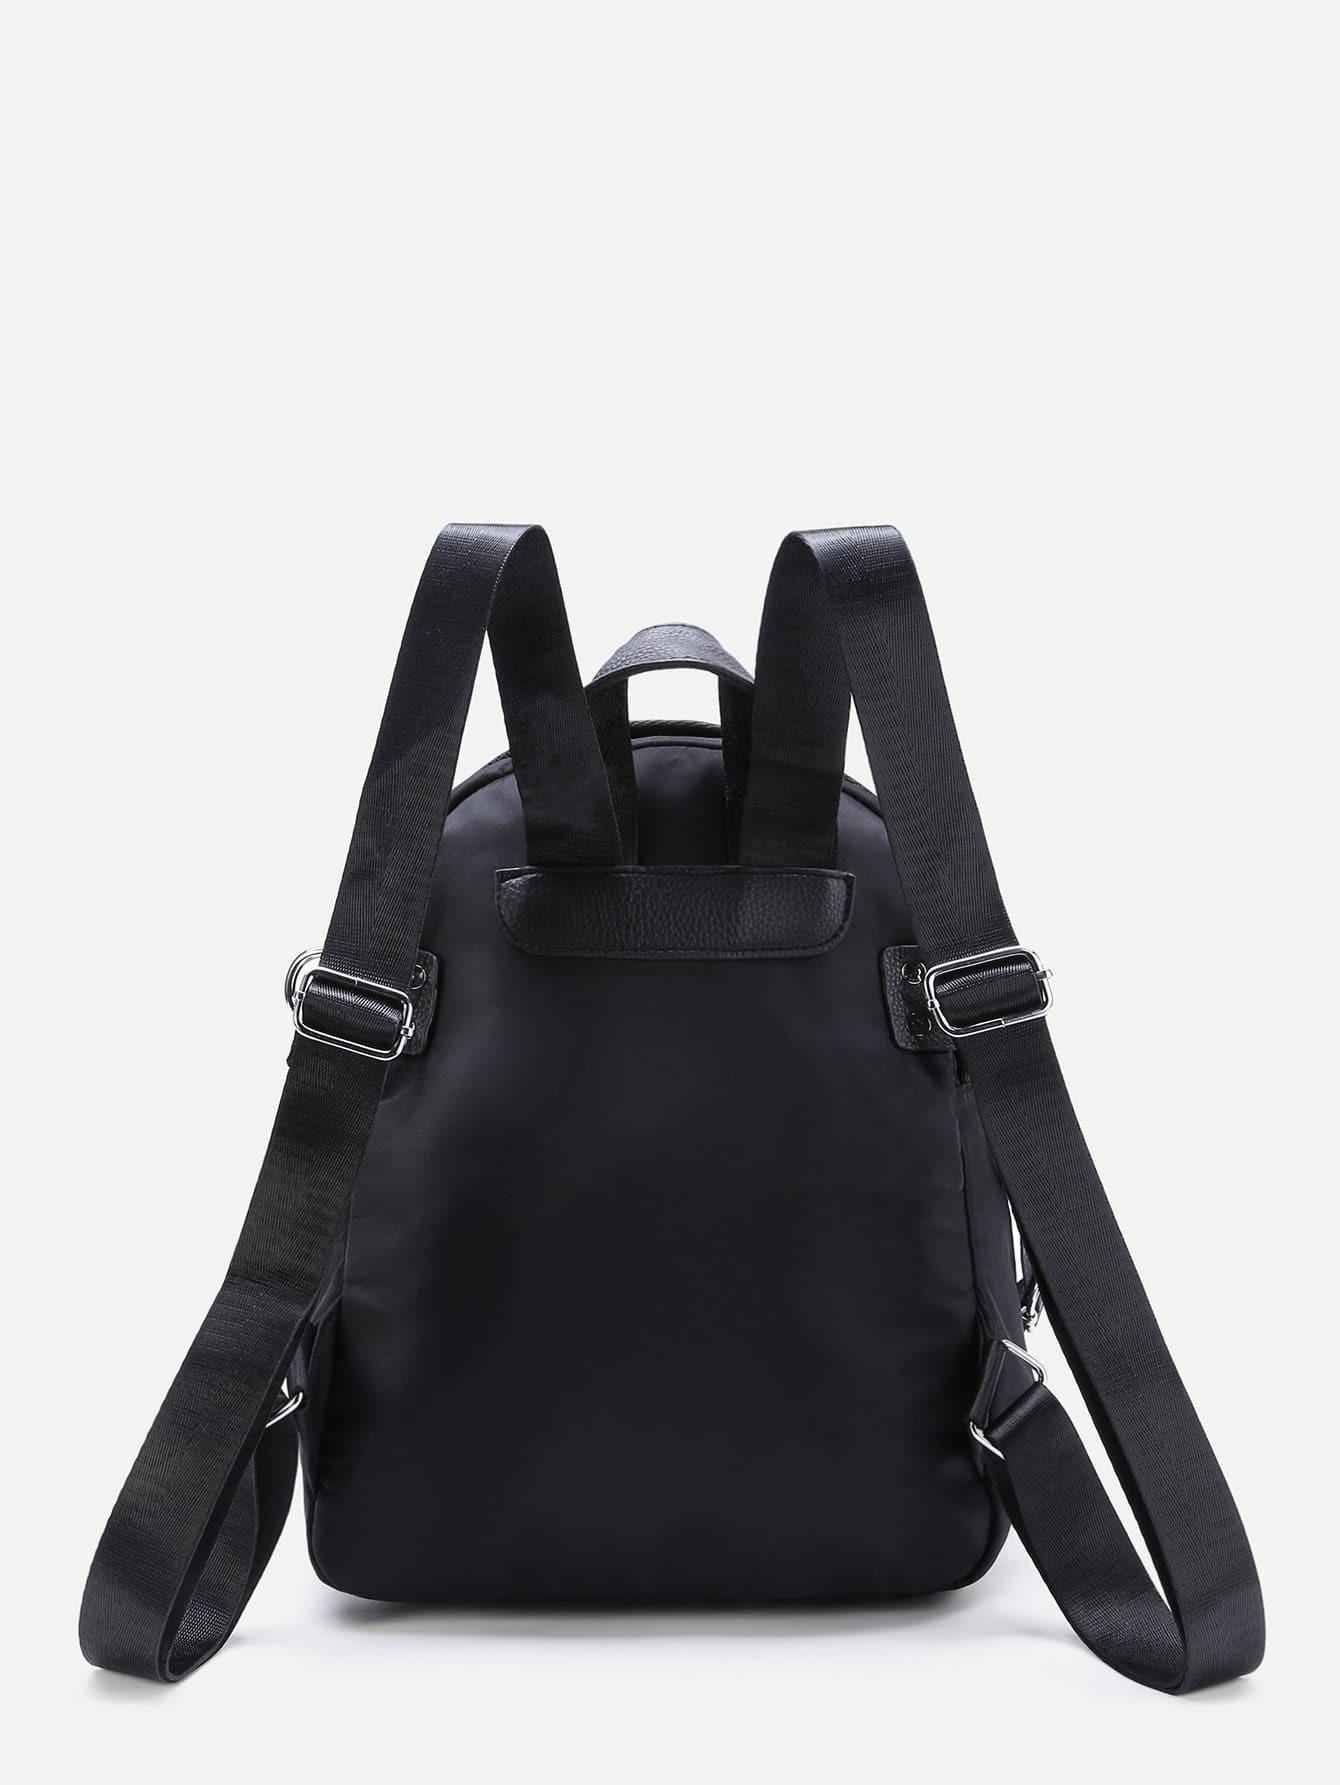 sac dos d coratif avec bracelet convertible et franges french romwe. Black Bedroom Furniture Sets. Home Design Ideas